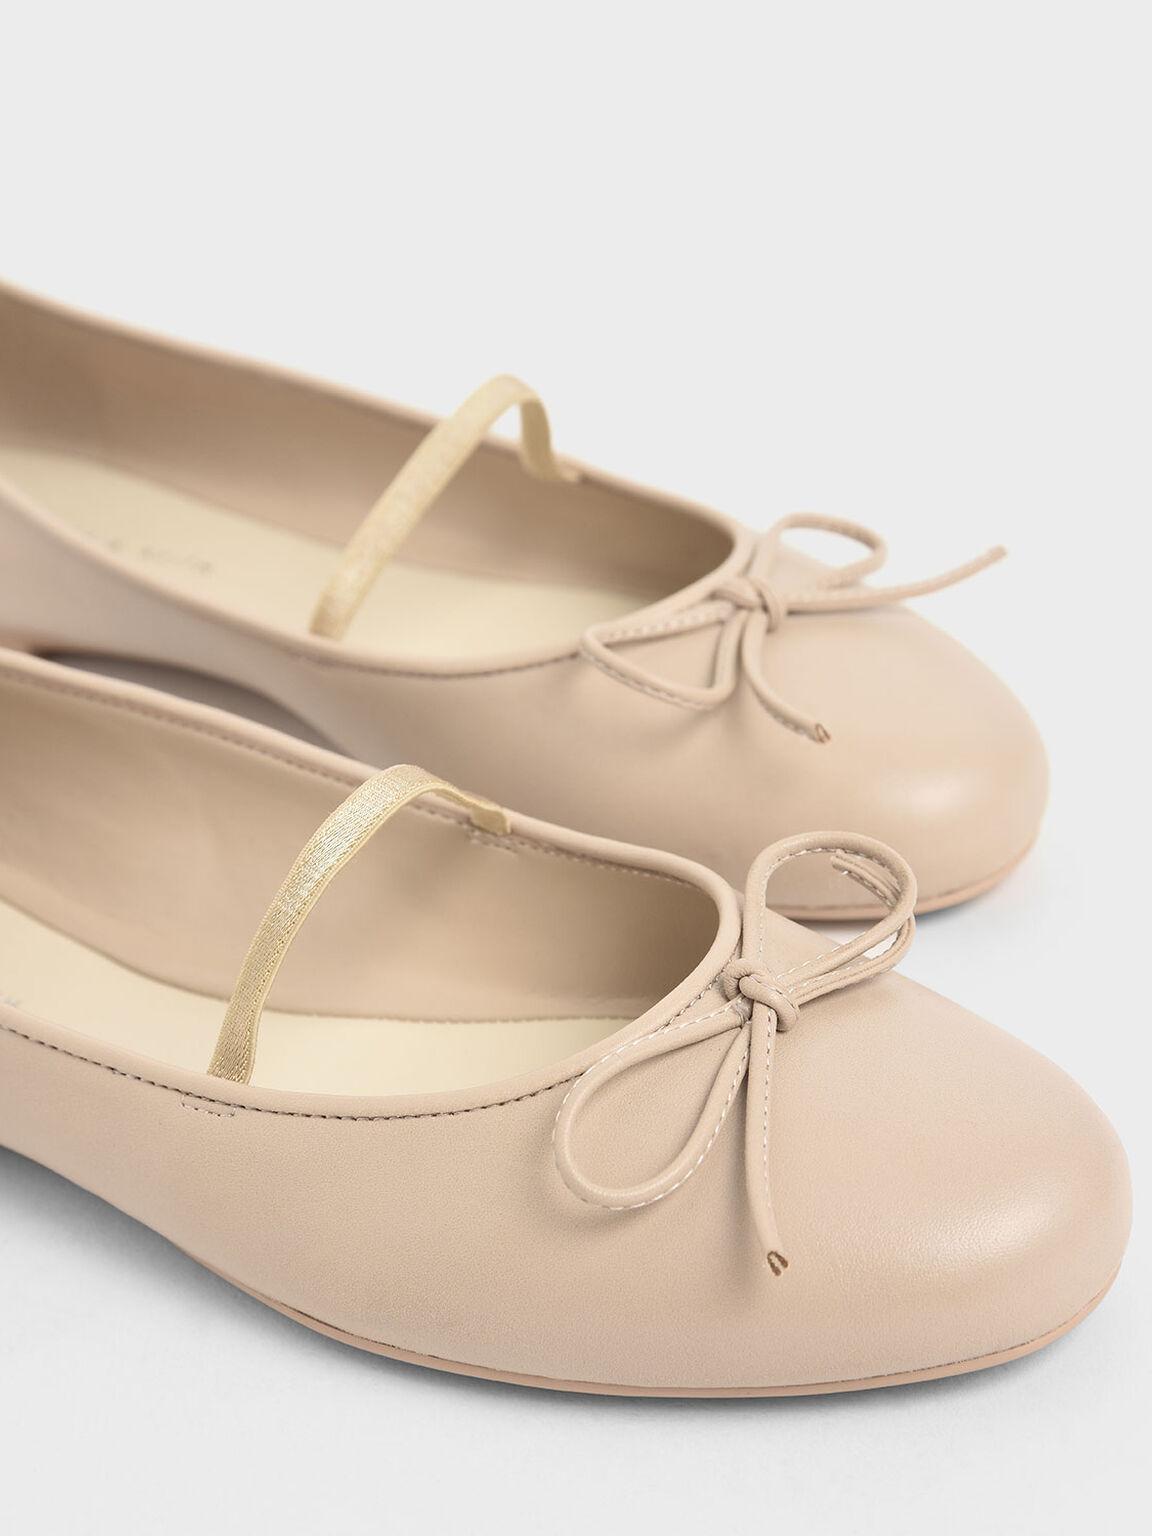 Ribbon Tie Mary Jane Ballerina Flats, Beige, hi-res